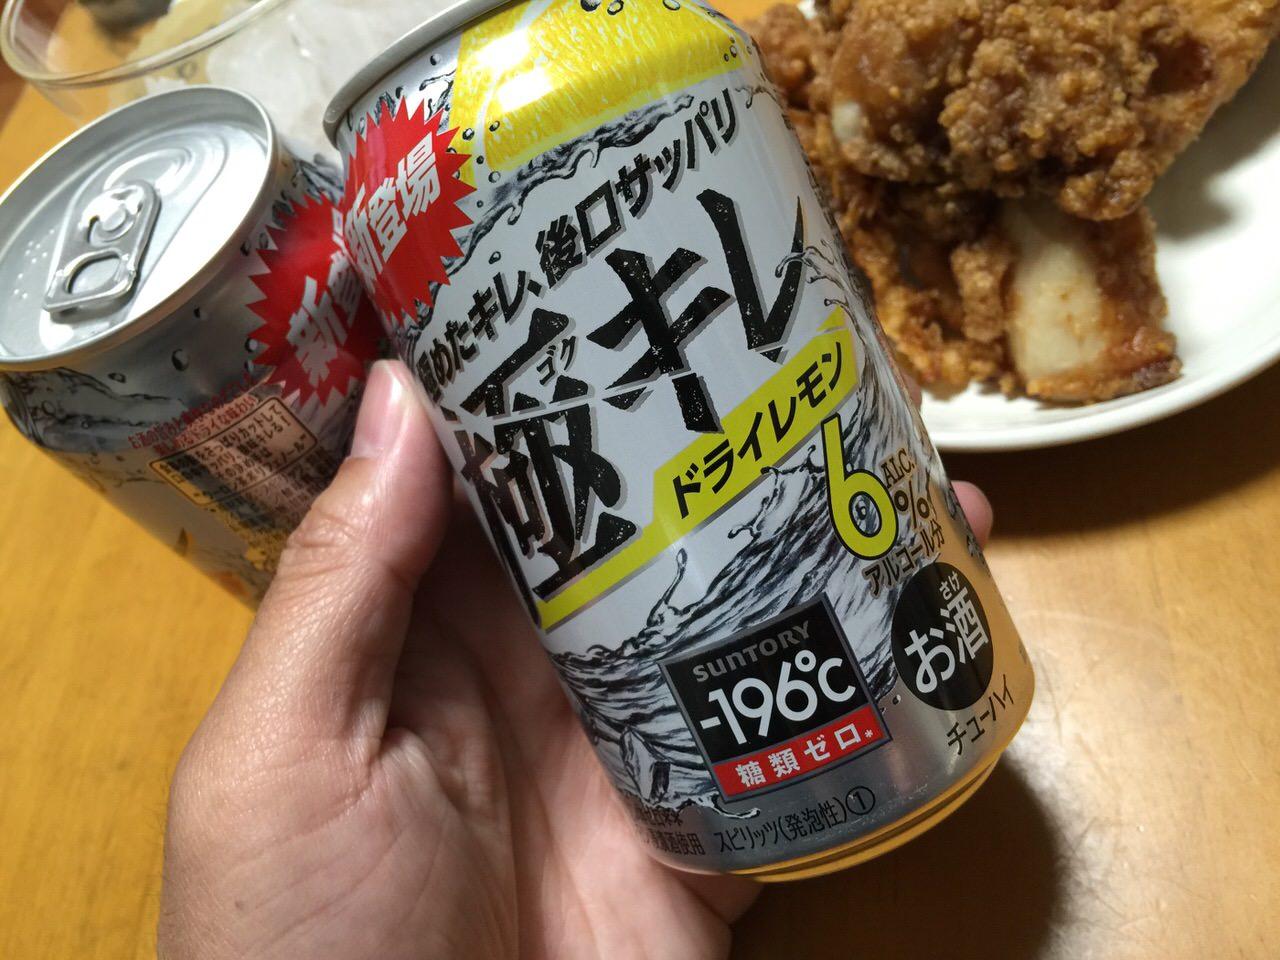 Suntory gokukire 2715